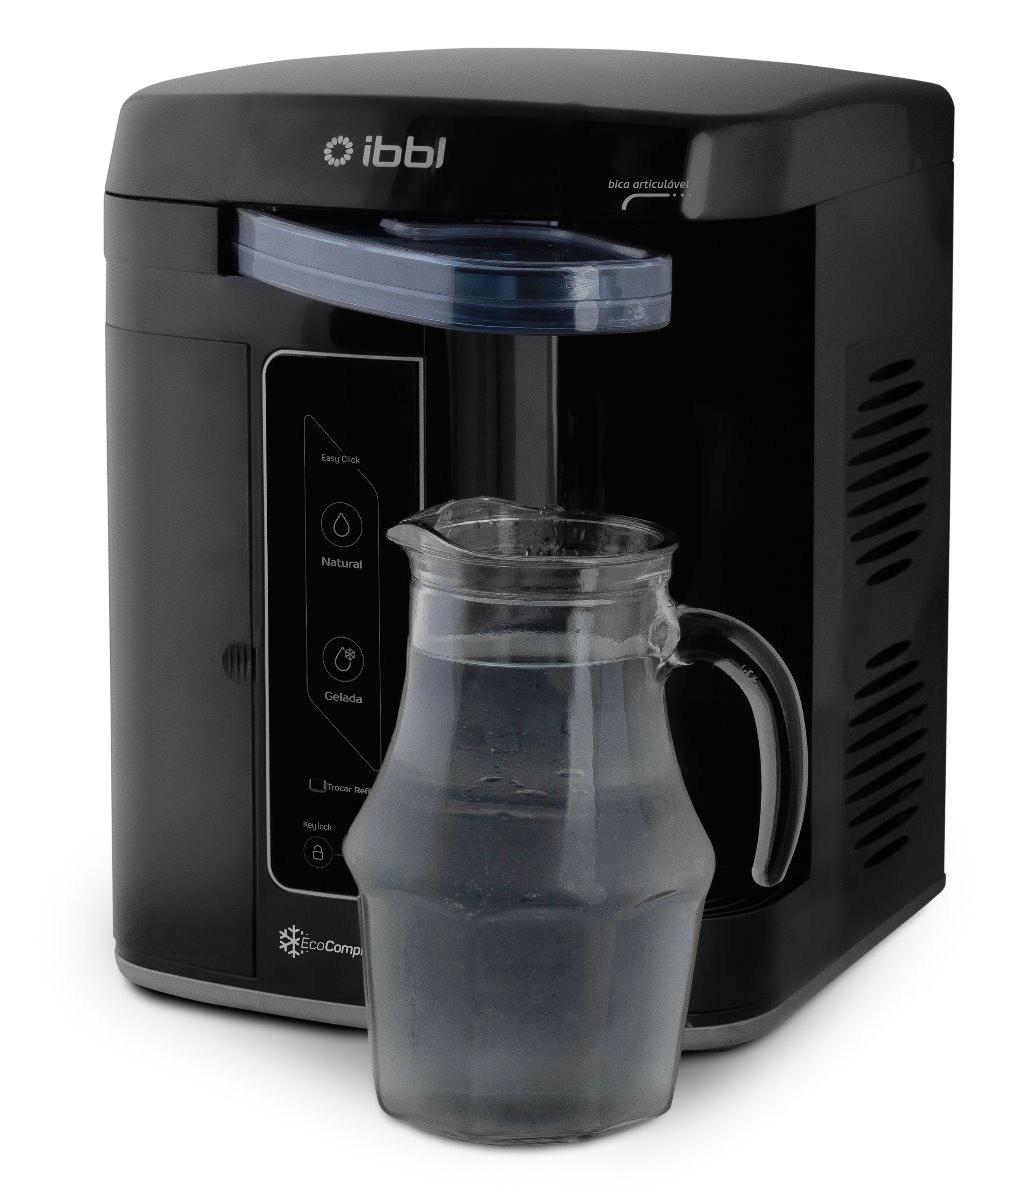 Innovare IBBL Preto água gelada